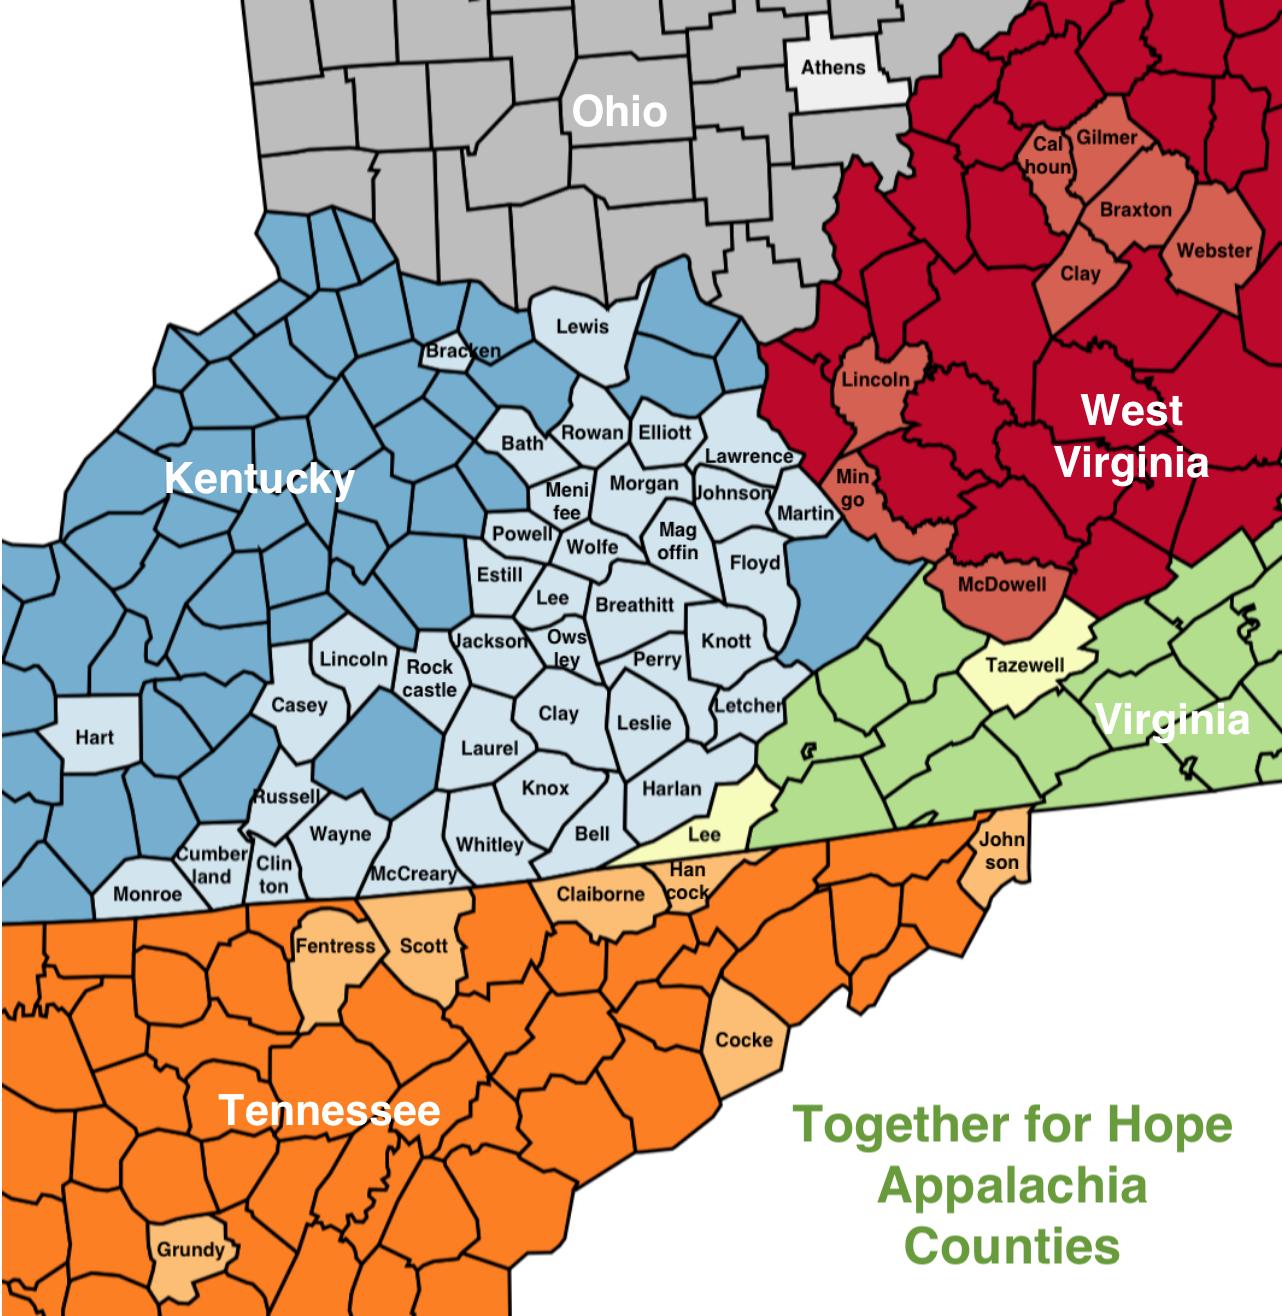 TFH Appalachia Counties .png